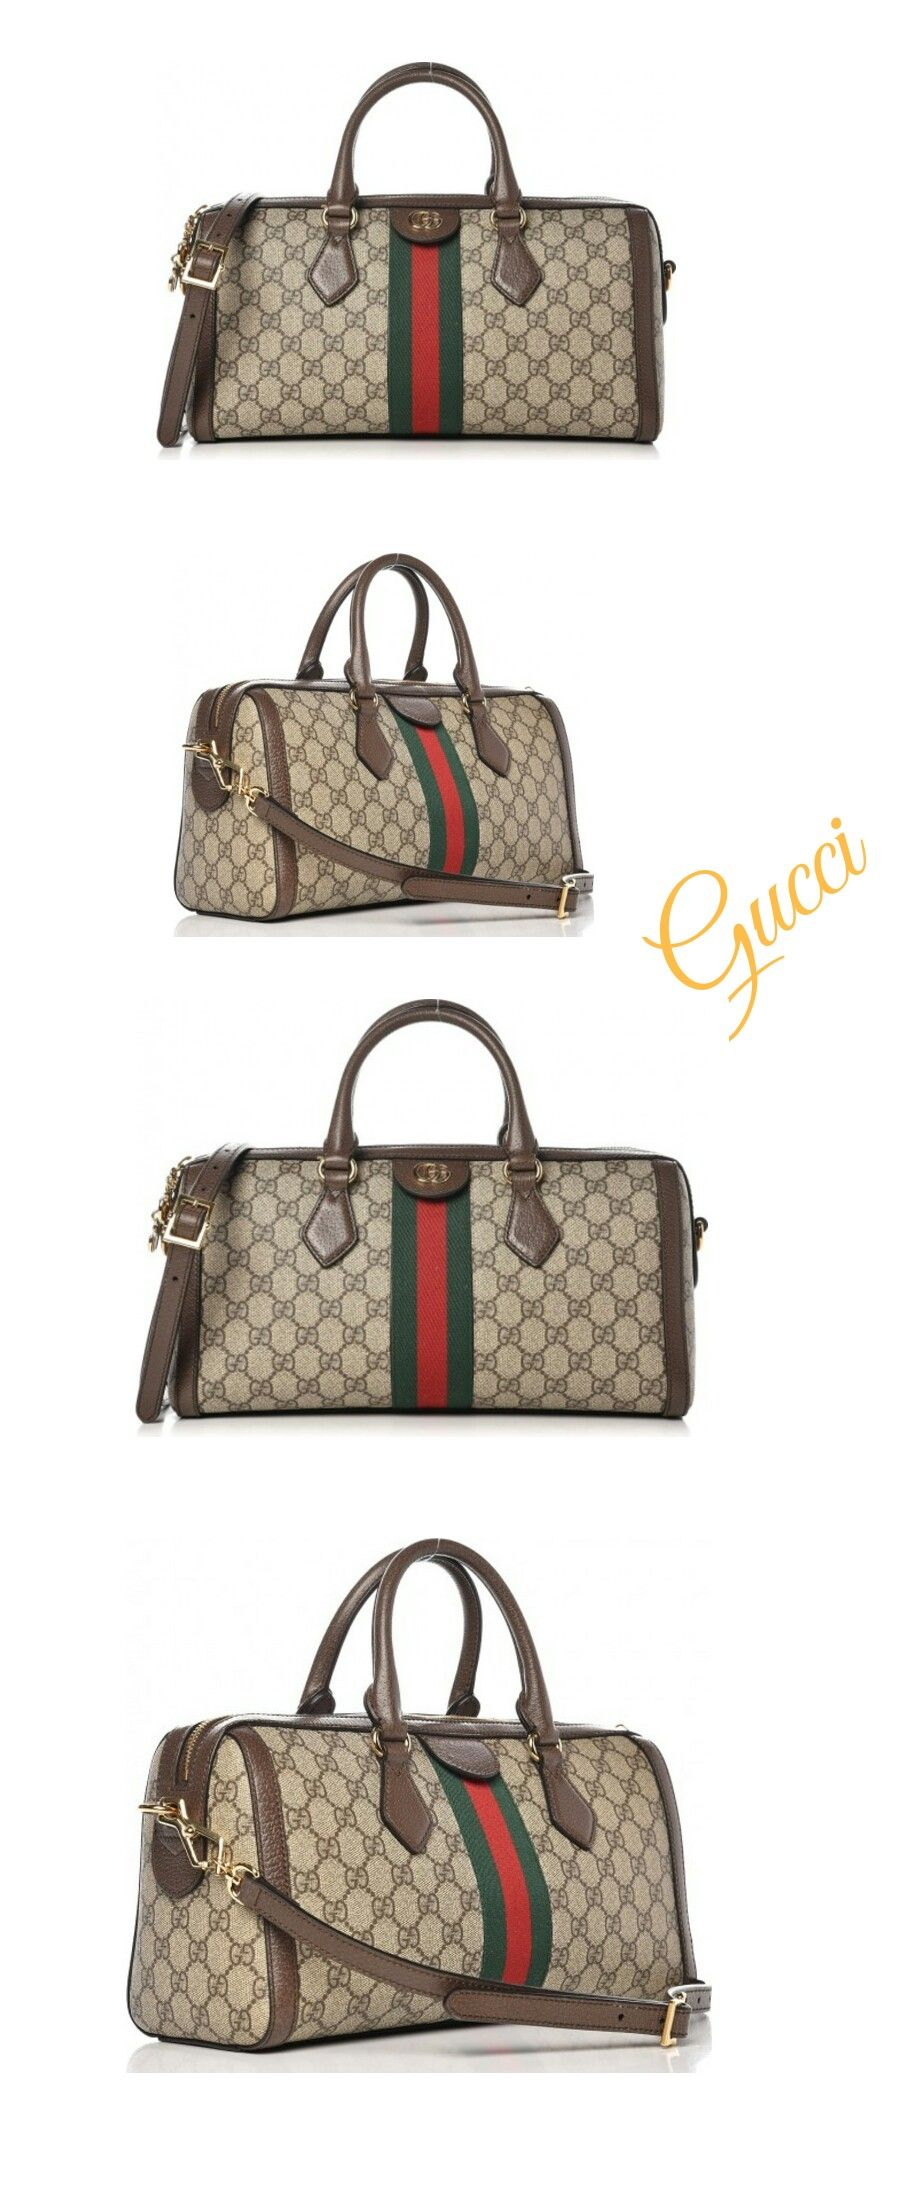 ac3cfaa2b362 Gucci Gucci Ophidia Top Handle Monogram GG Supreme Web Medium Brown .#add#affiliate